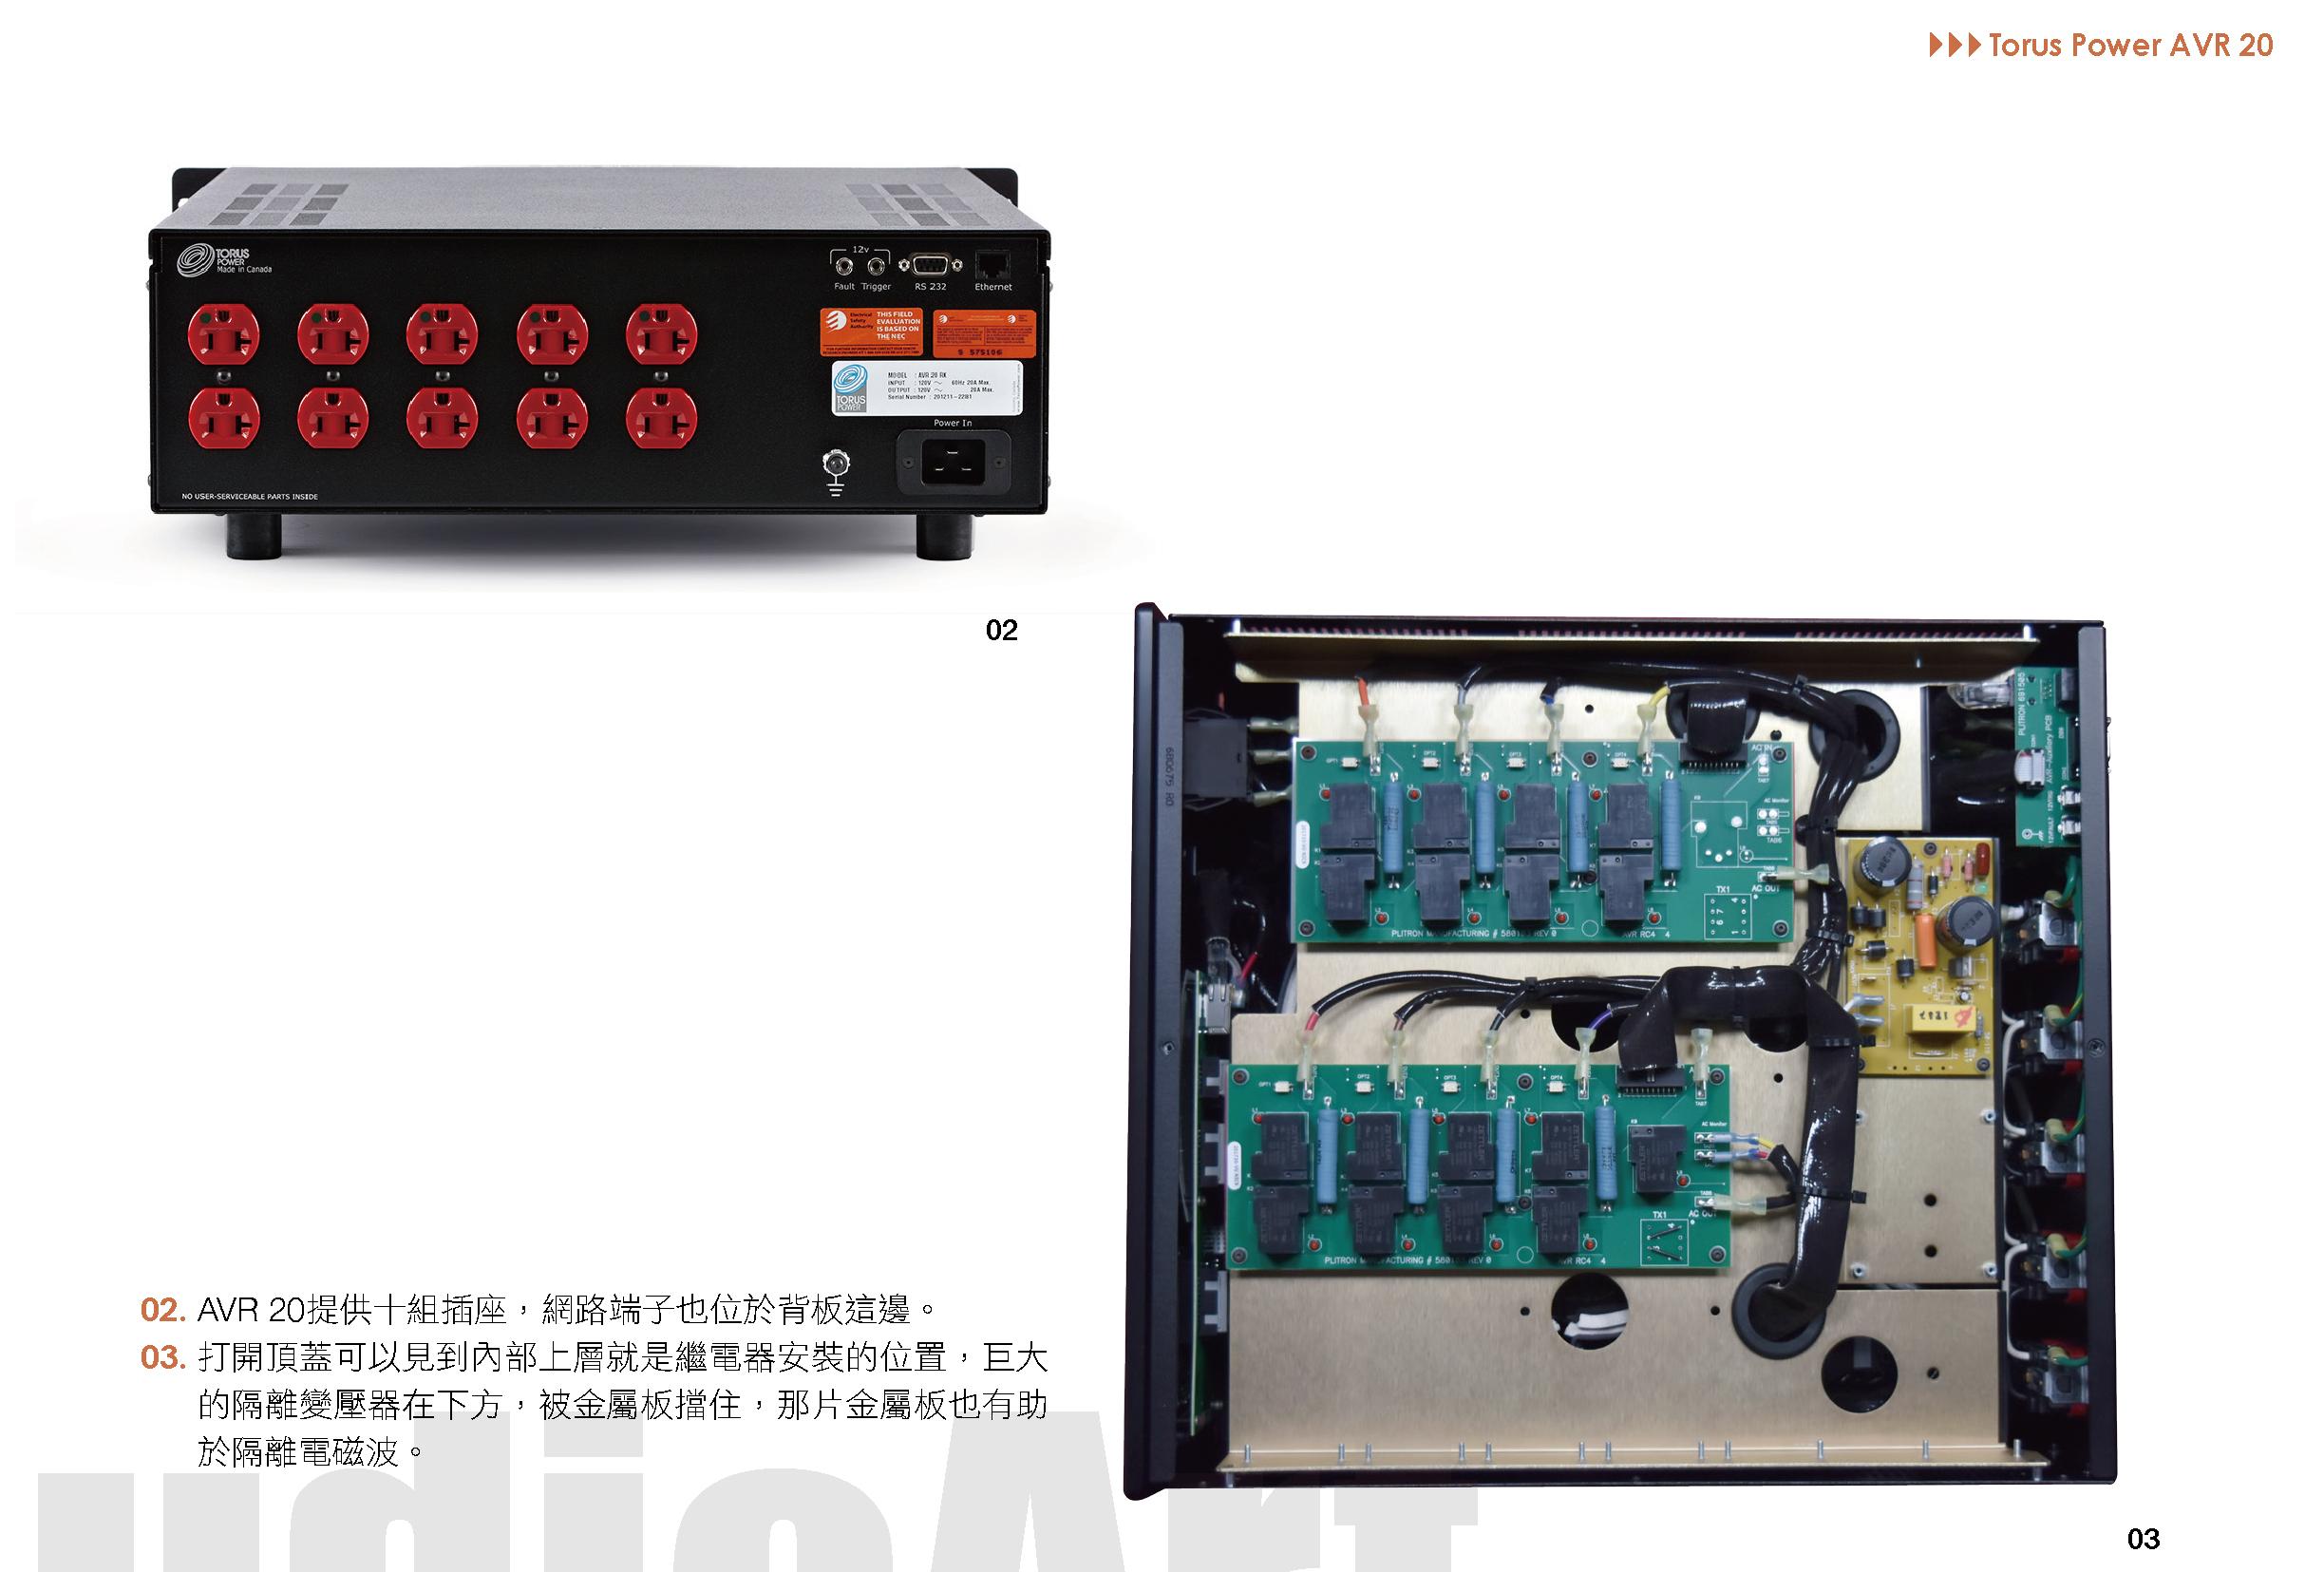 Torus Power AVR 20內部結構剖析